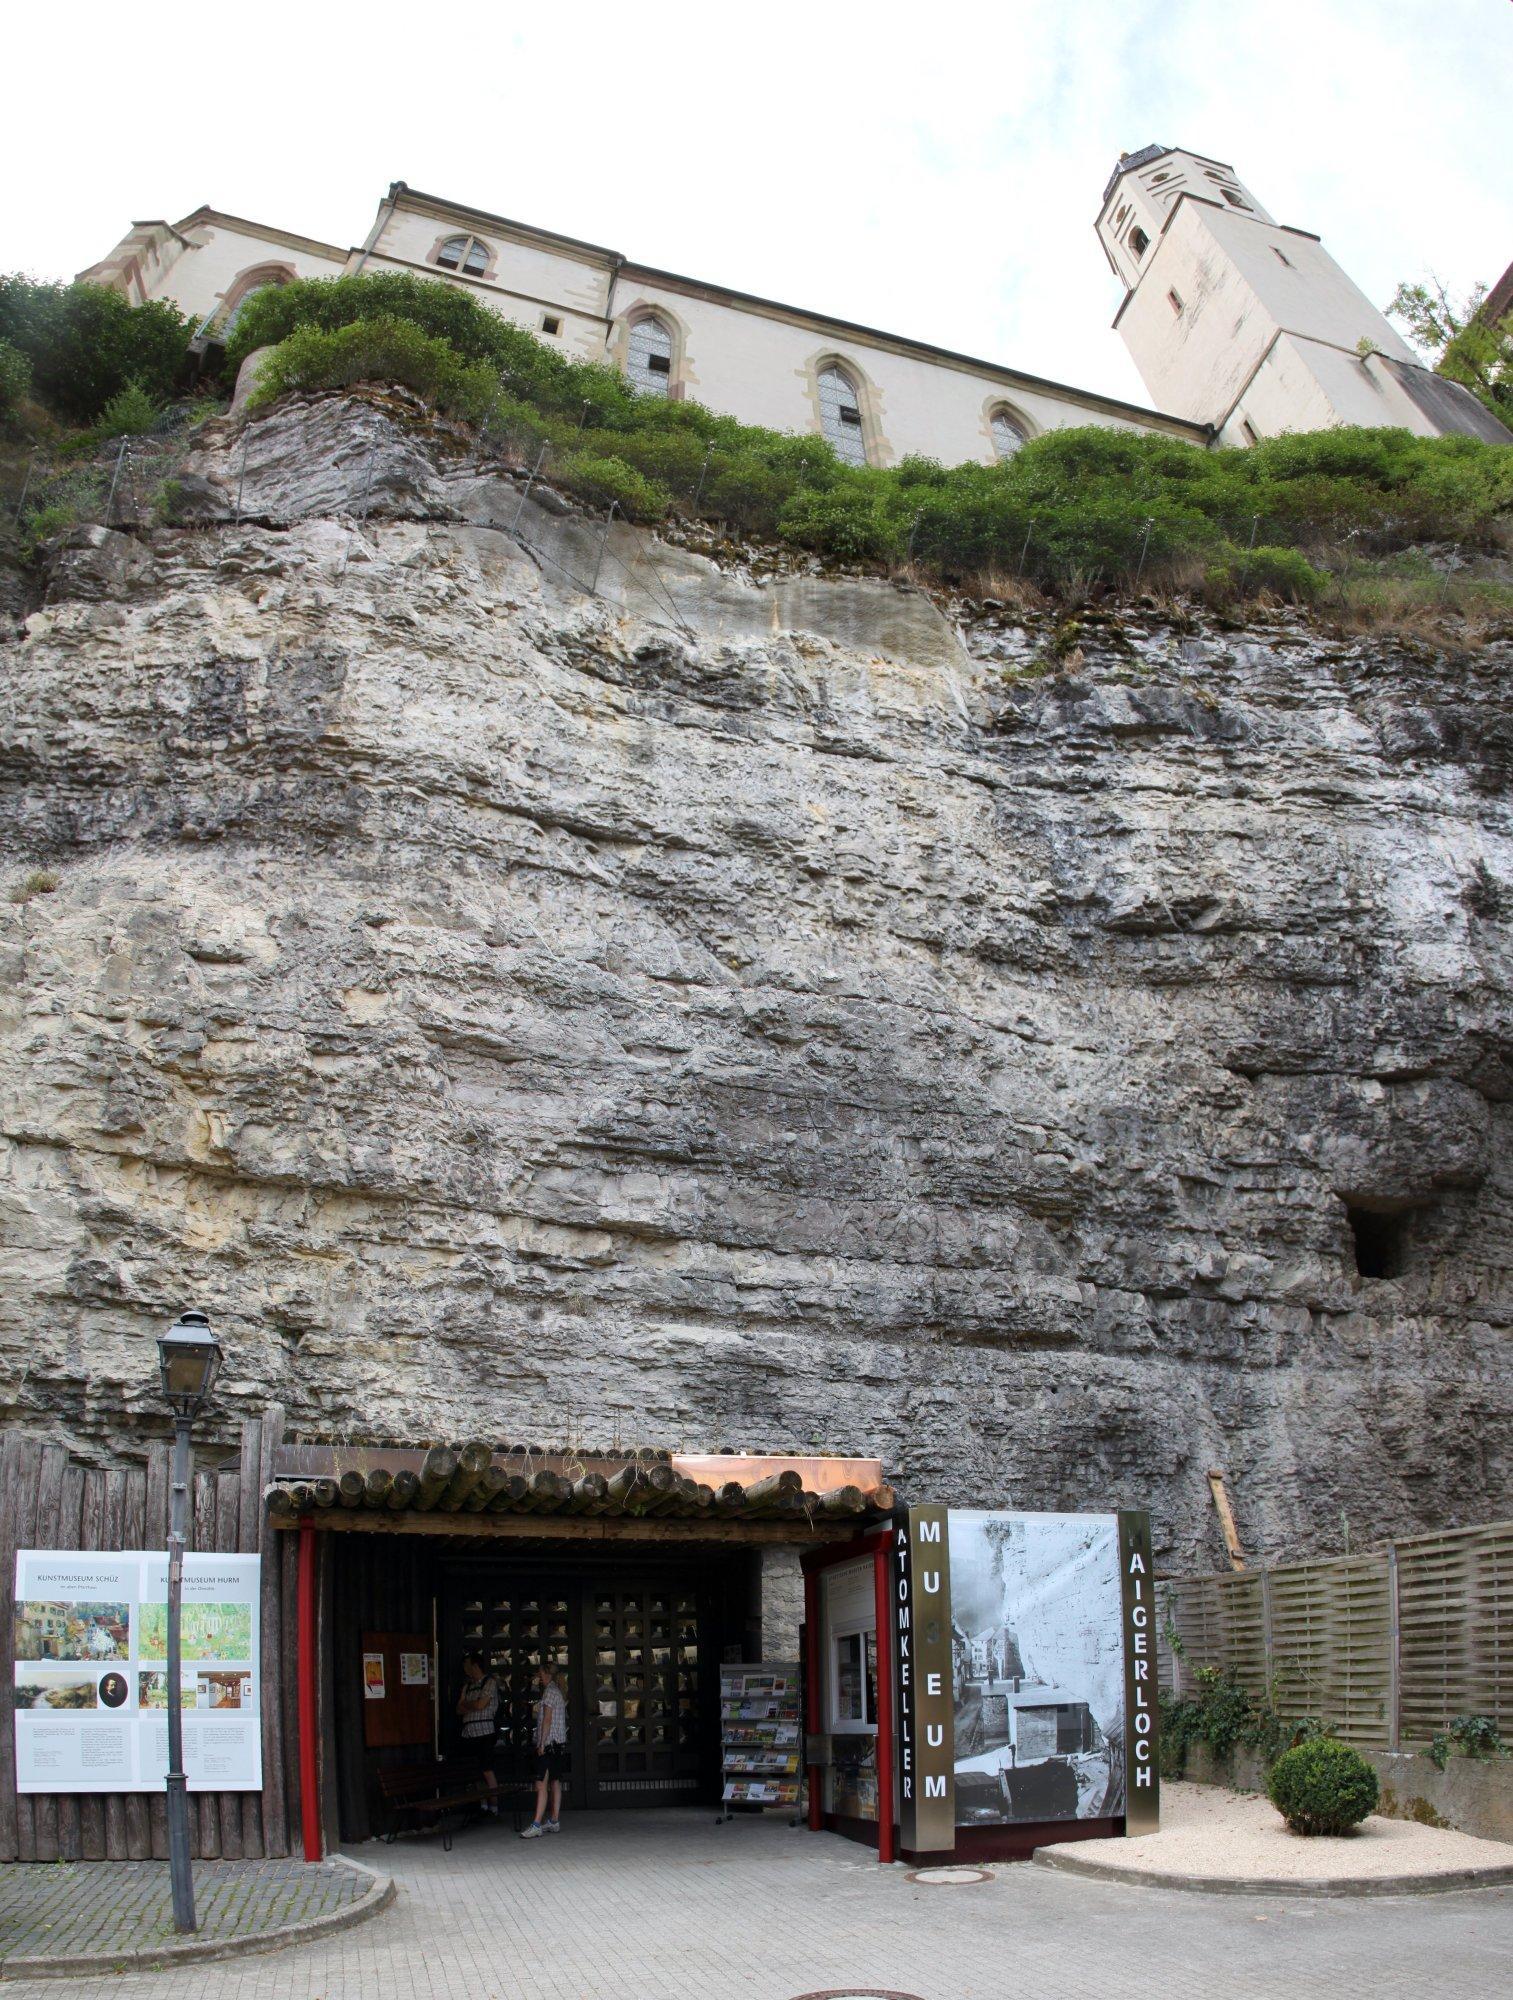 [Link auf https://commons.wikimedia.org/wiki/File:Haigerloch_Schlossfelsen_Schlosskirche_Atomkeller-Museum_2013-08-18.jpg]